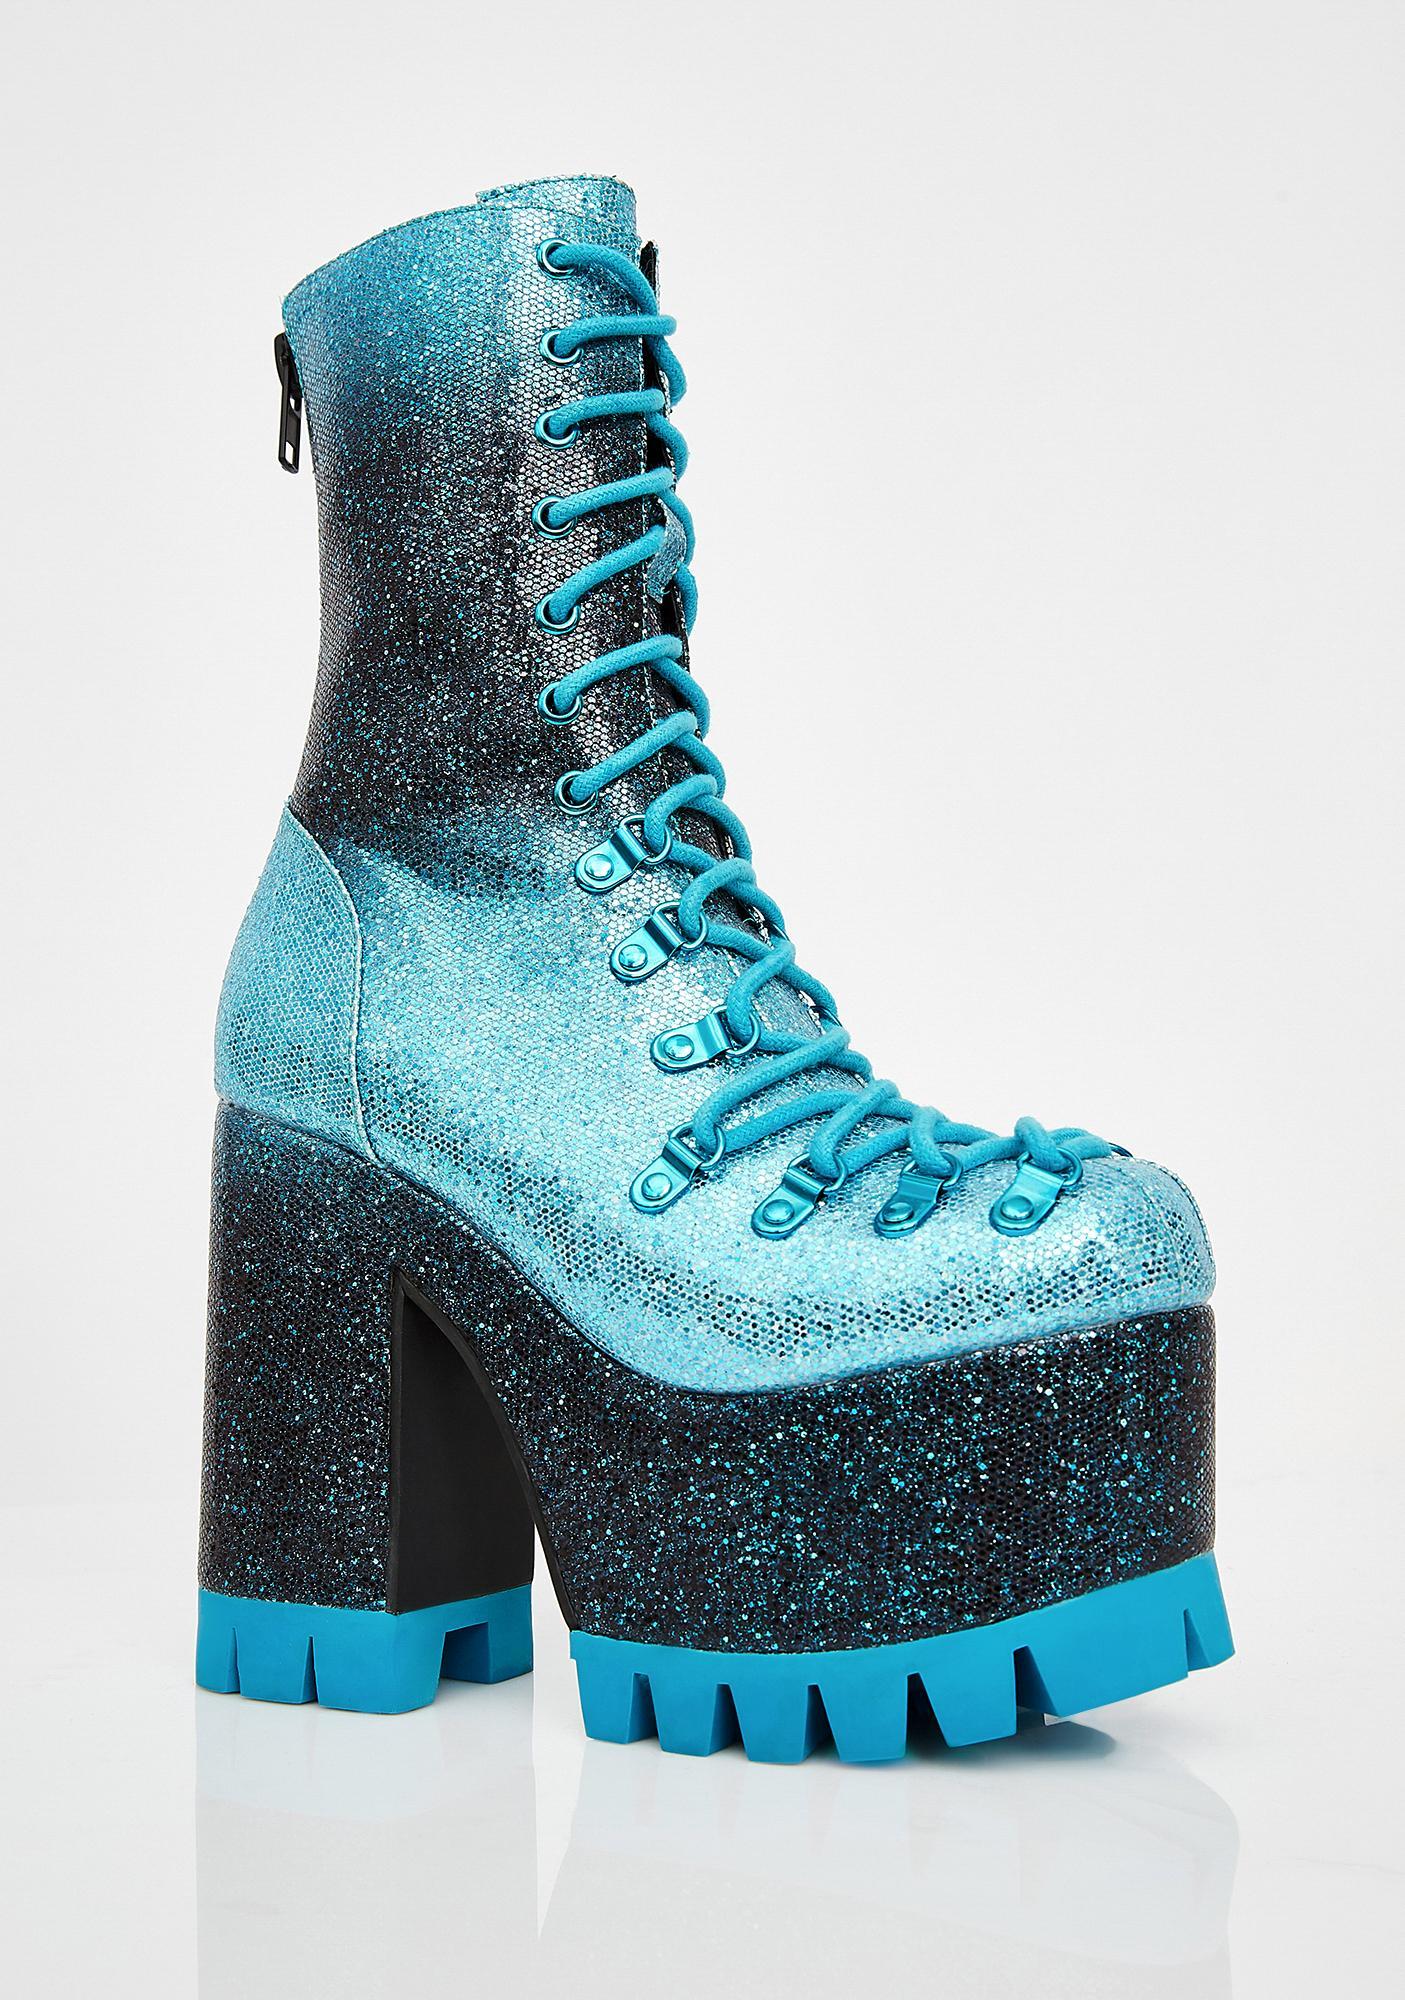 Club Exx Lucid Dreamer Glitter Boots